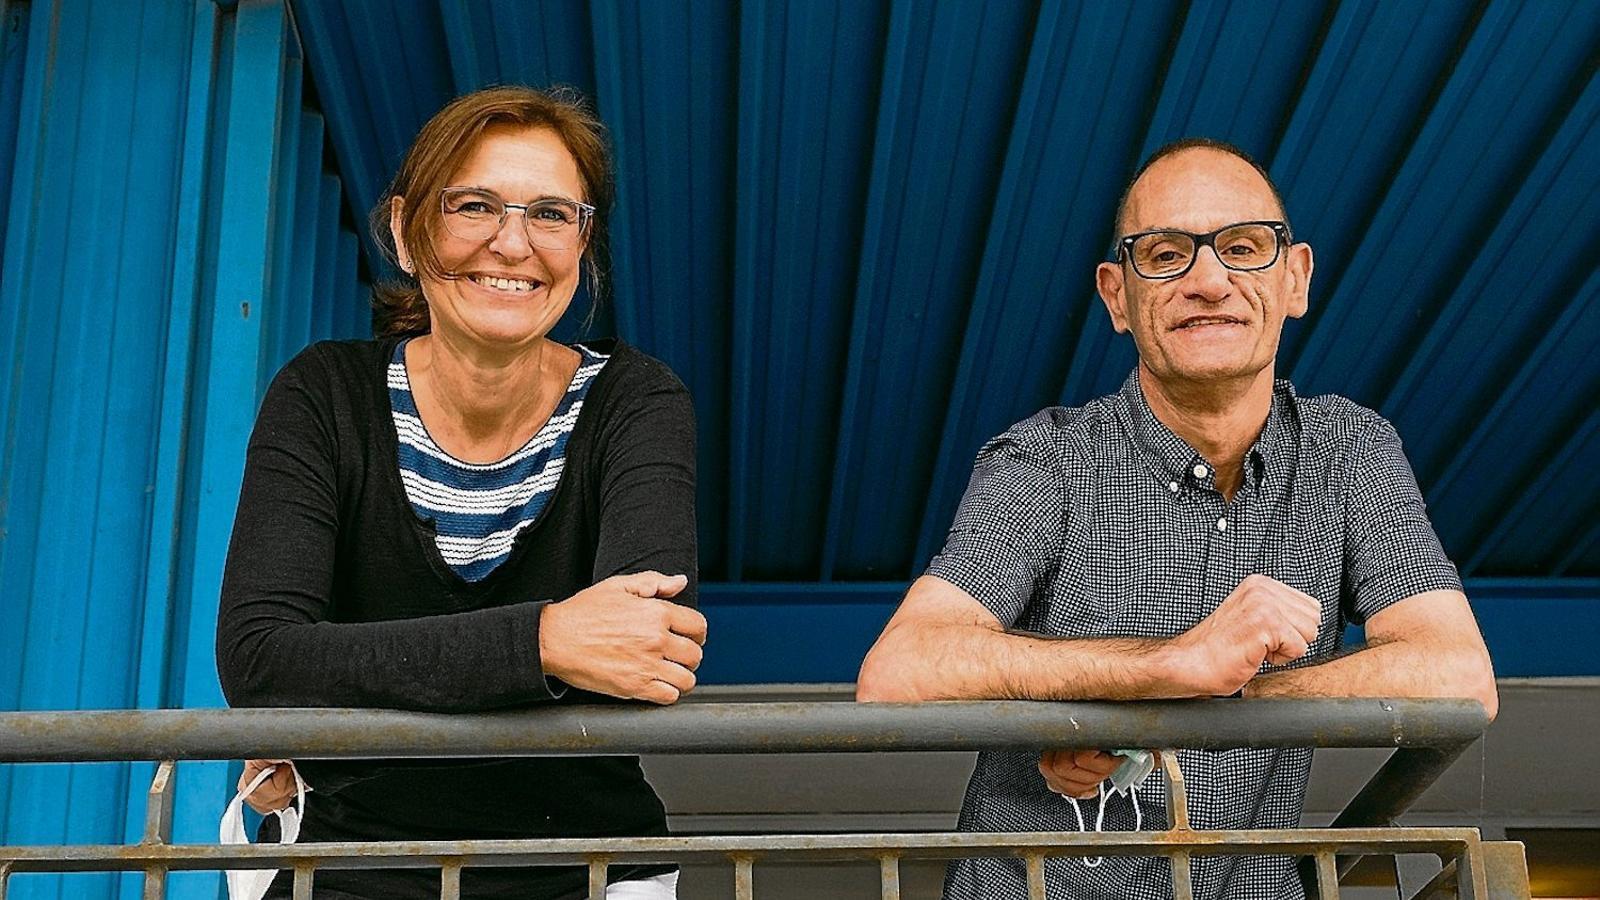 Isabel Llorens, de la Fundació Dau, i Javier Caro, usuari